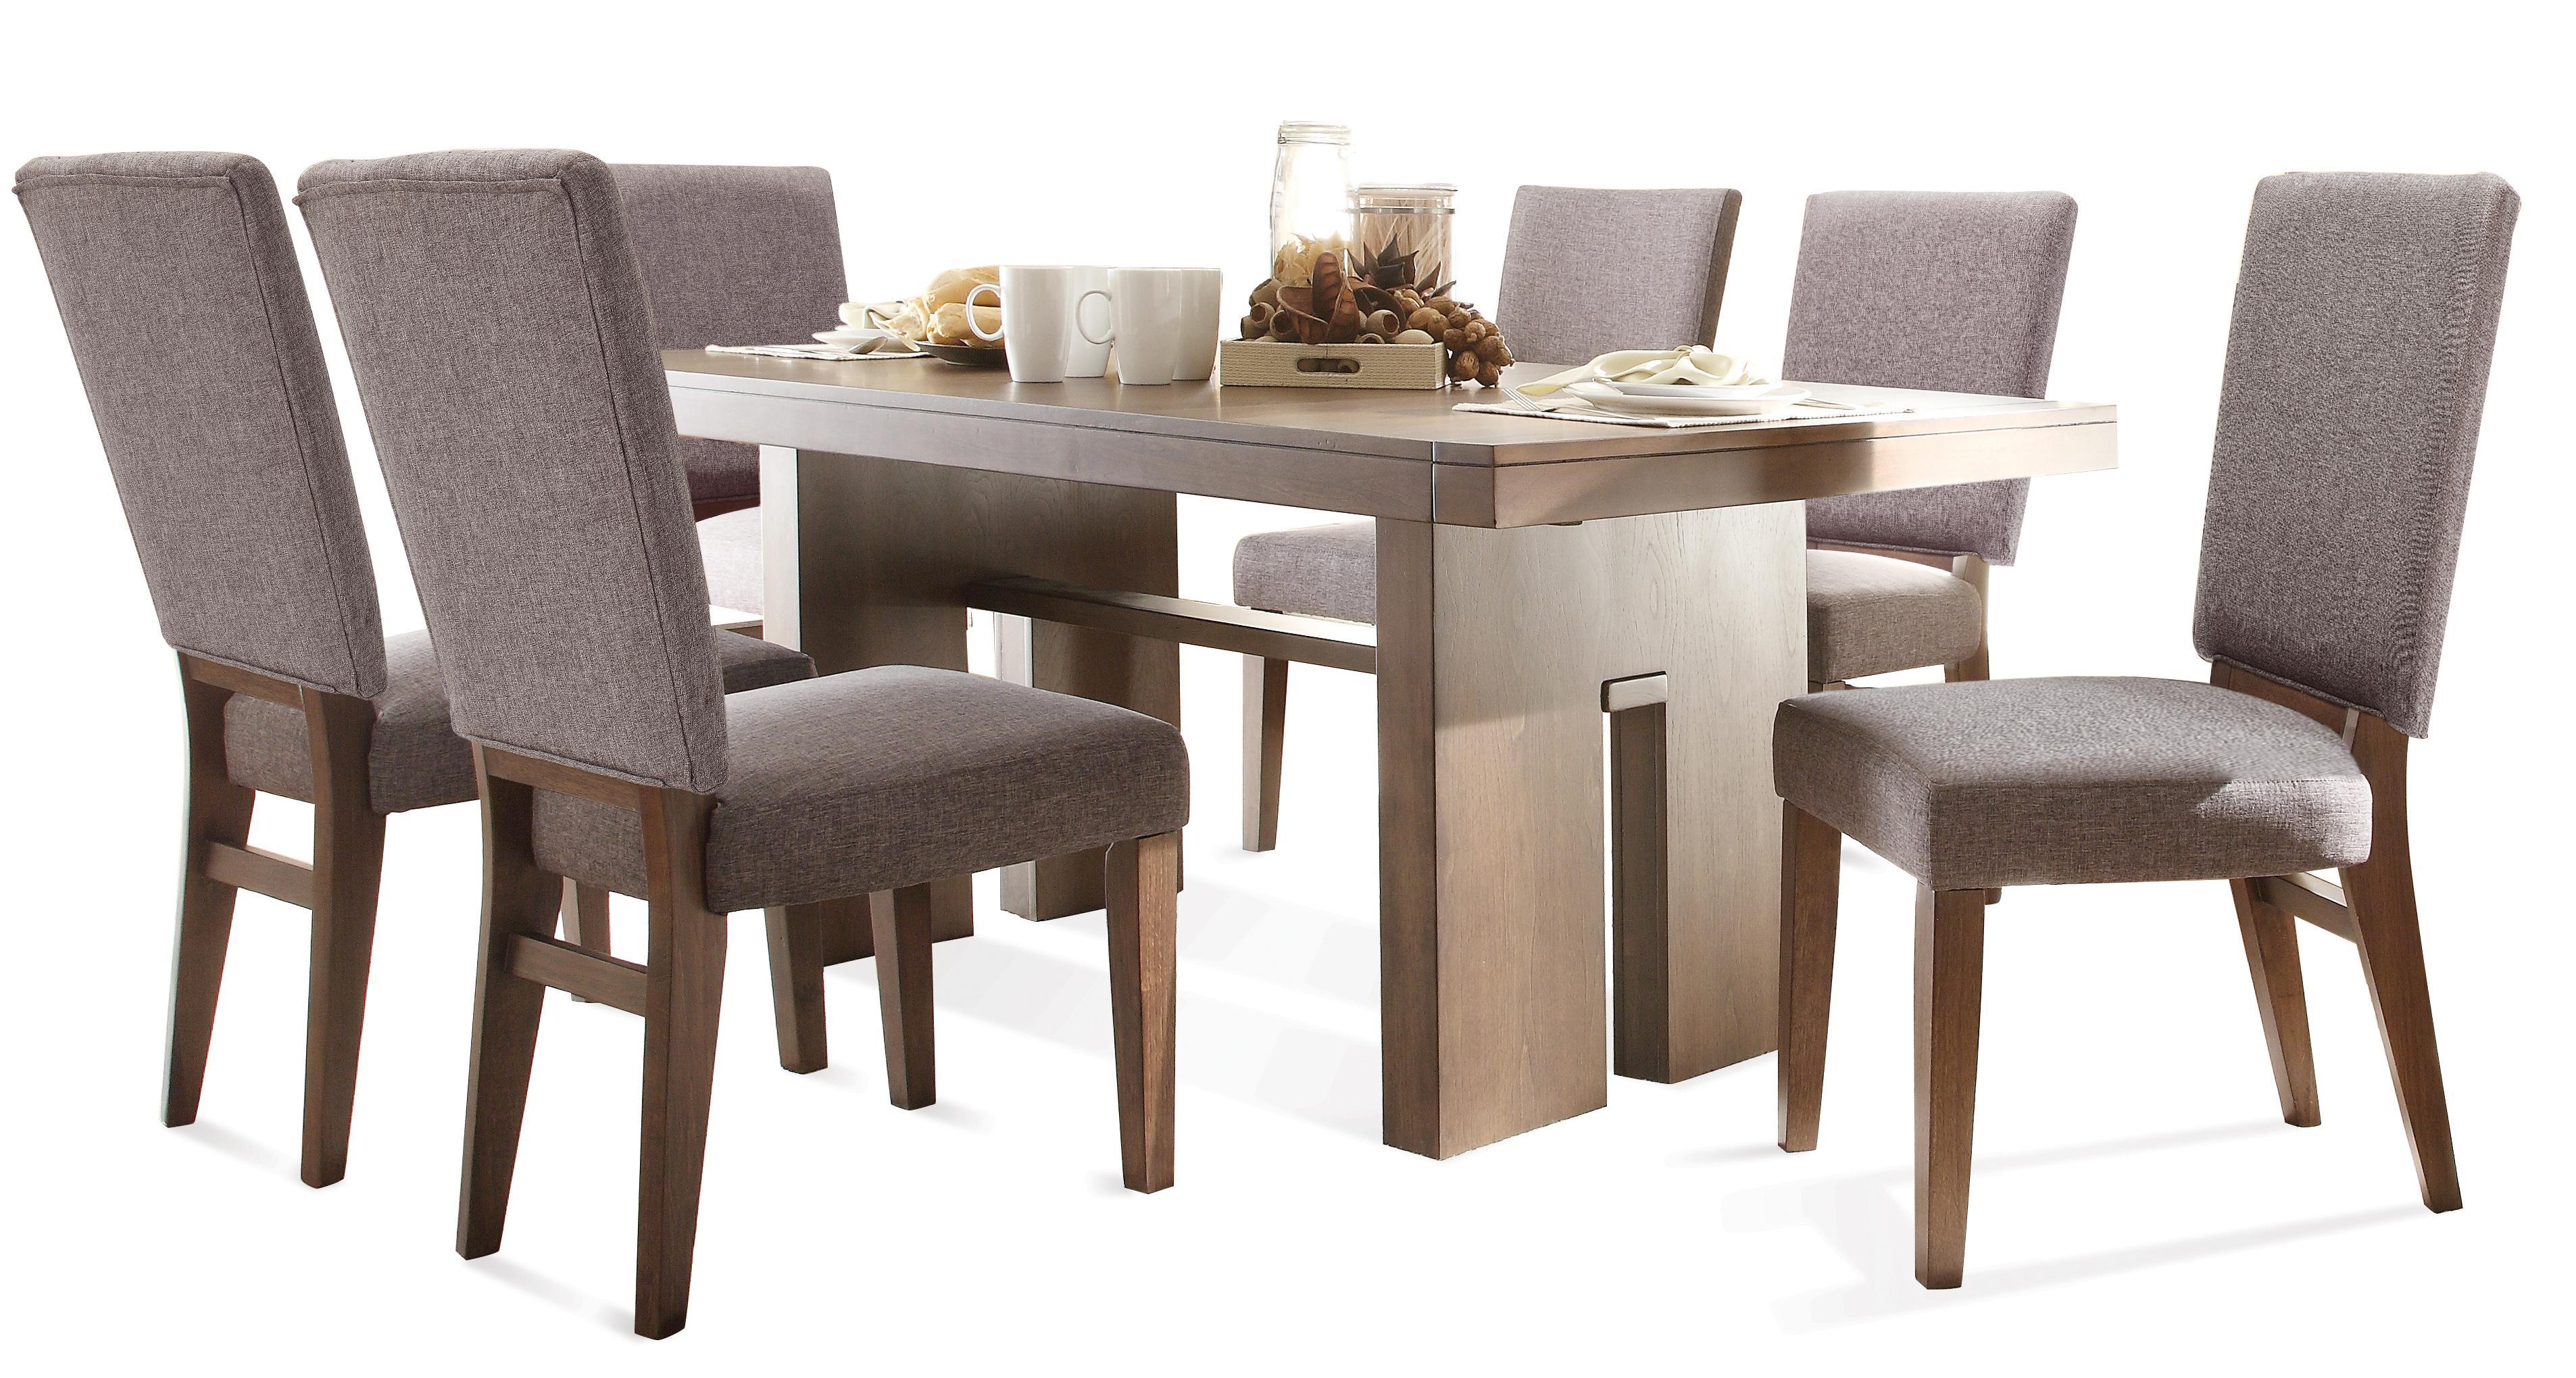 Riverside Furniture Terra Vista 7 PC Table & Chair Set - Item Number: 98850+51+6x57